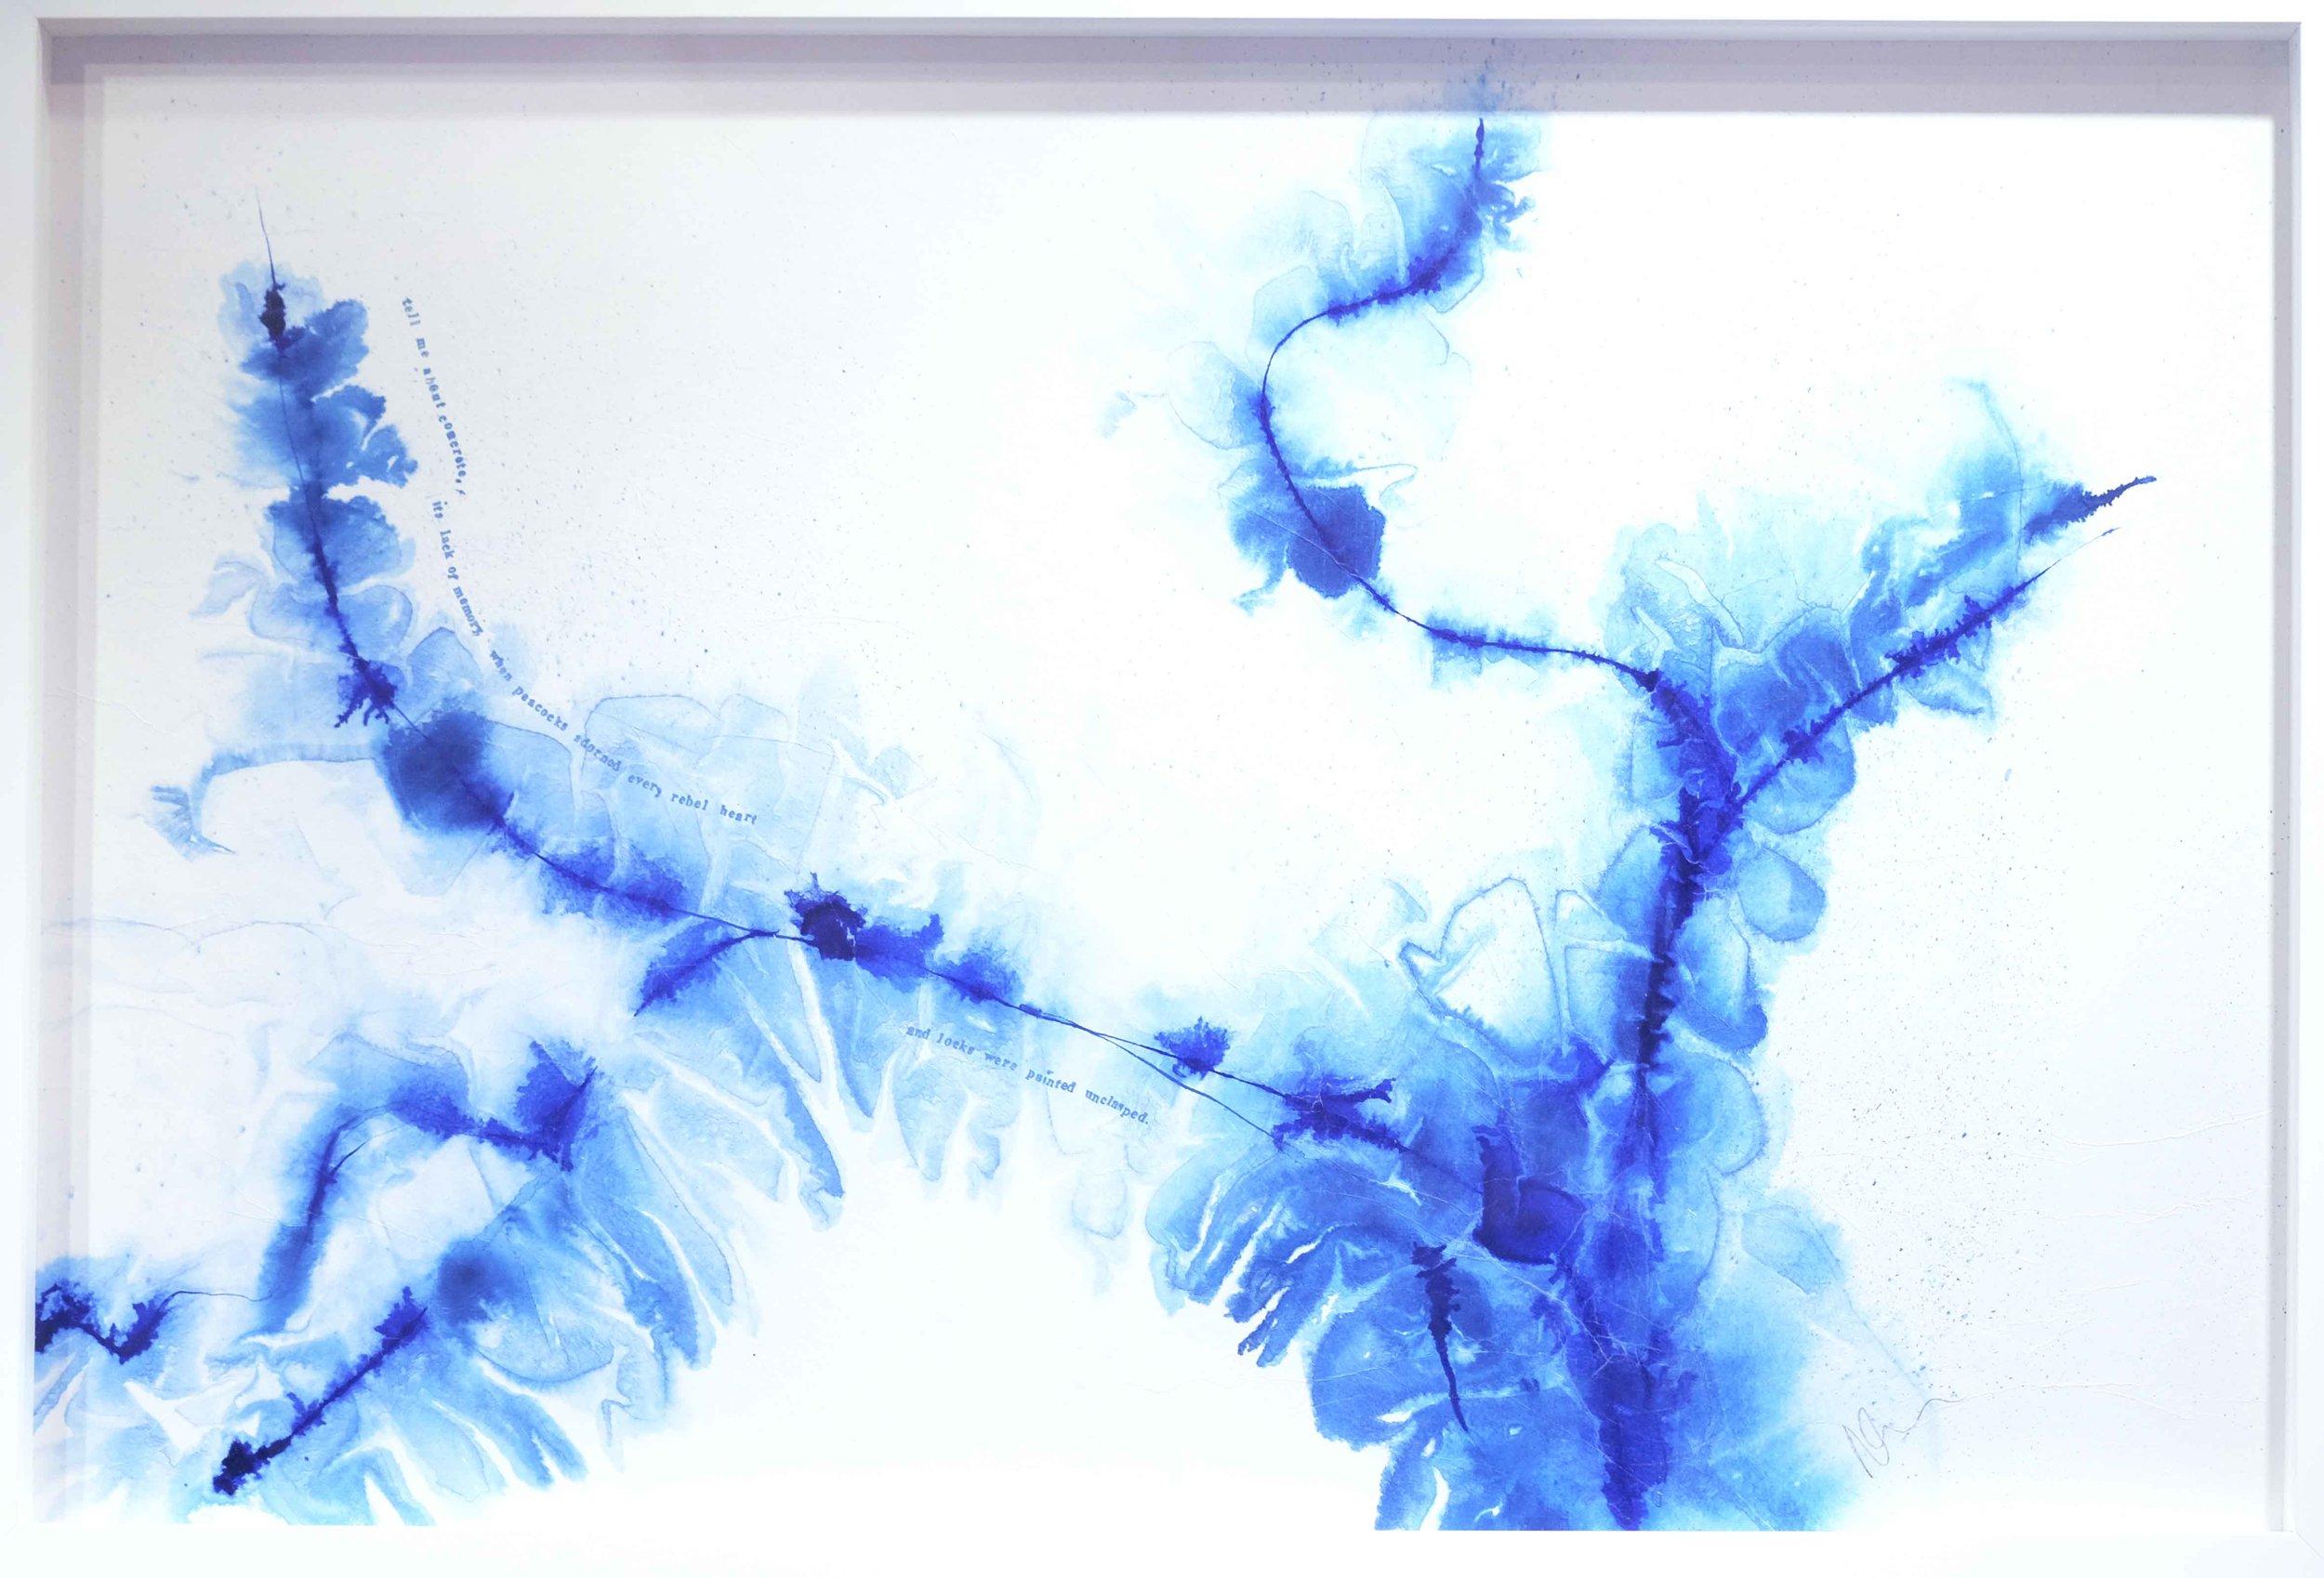 Nicola Anthony, Beneath the Gleaming Glisten, Ink on tree-skin paper, 50cm x 73cm, 2016_(c) Nicola Anthony